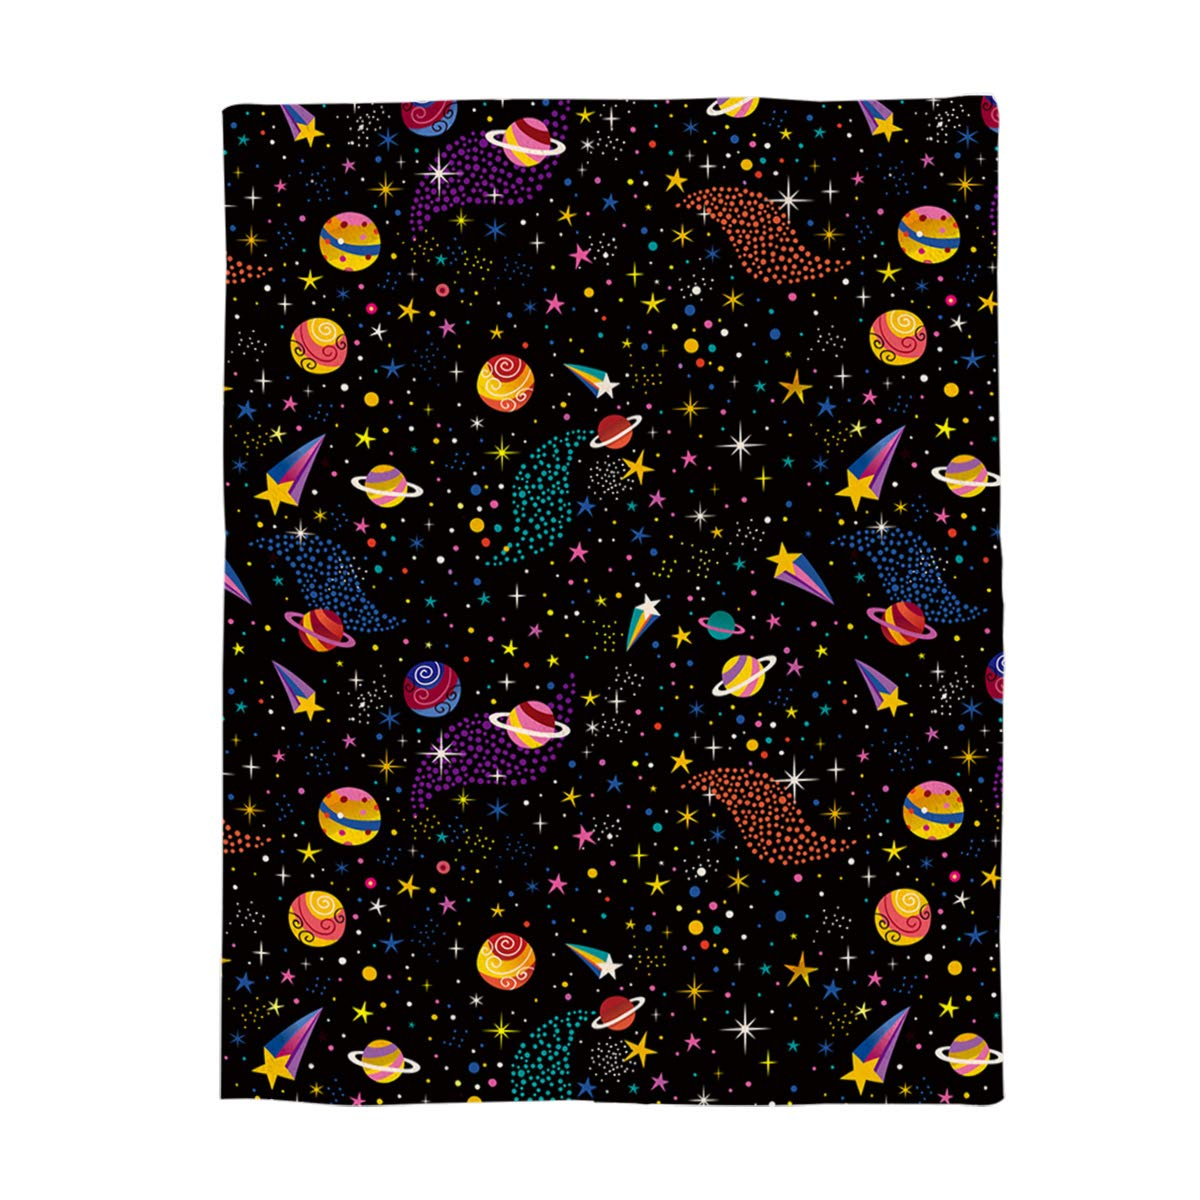 Cosmos 812lyag1895 49x59inch=125x150cm YEHO Art Gallery Flannel Fleece Bed Blanket Soft Throw-Blankets Home Decor,Cute Flaminigo Animal Patten,Lightweight Cozy Plush Blankets for Bedroom Living Room Sofa Couch,39 x 49 Inch